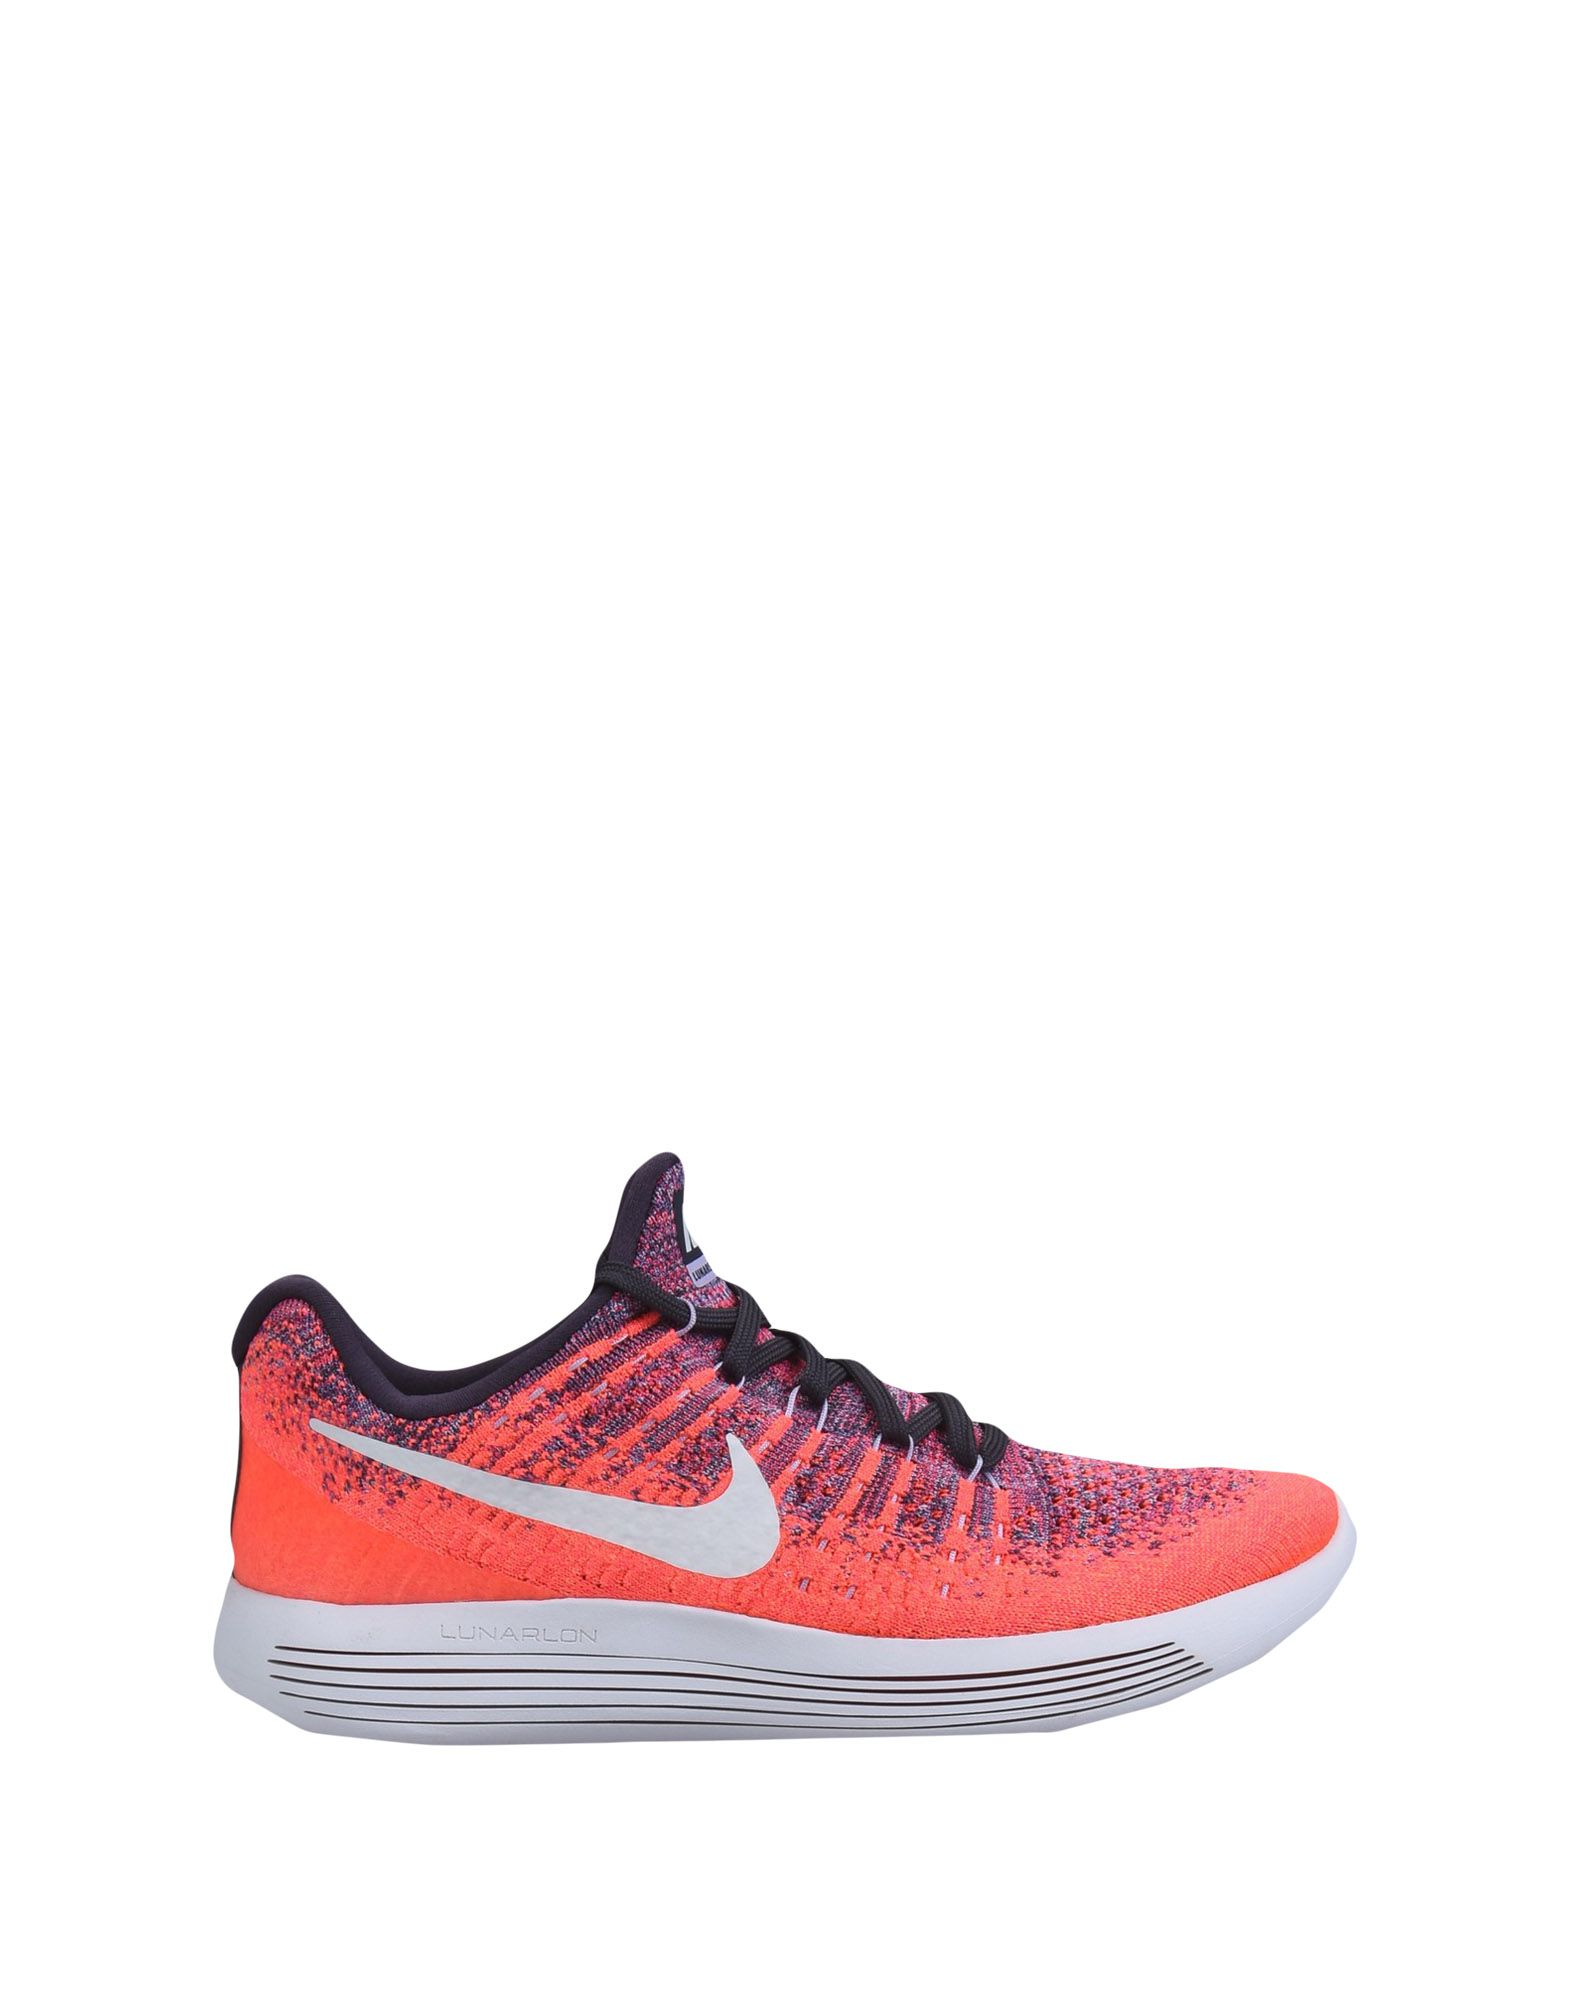 Nike   Lunarepic Low Flyknit 2  11266157HE Gute Qualität beliebte Schuhe